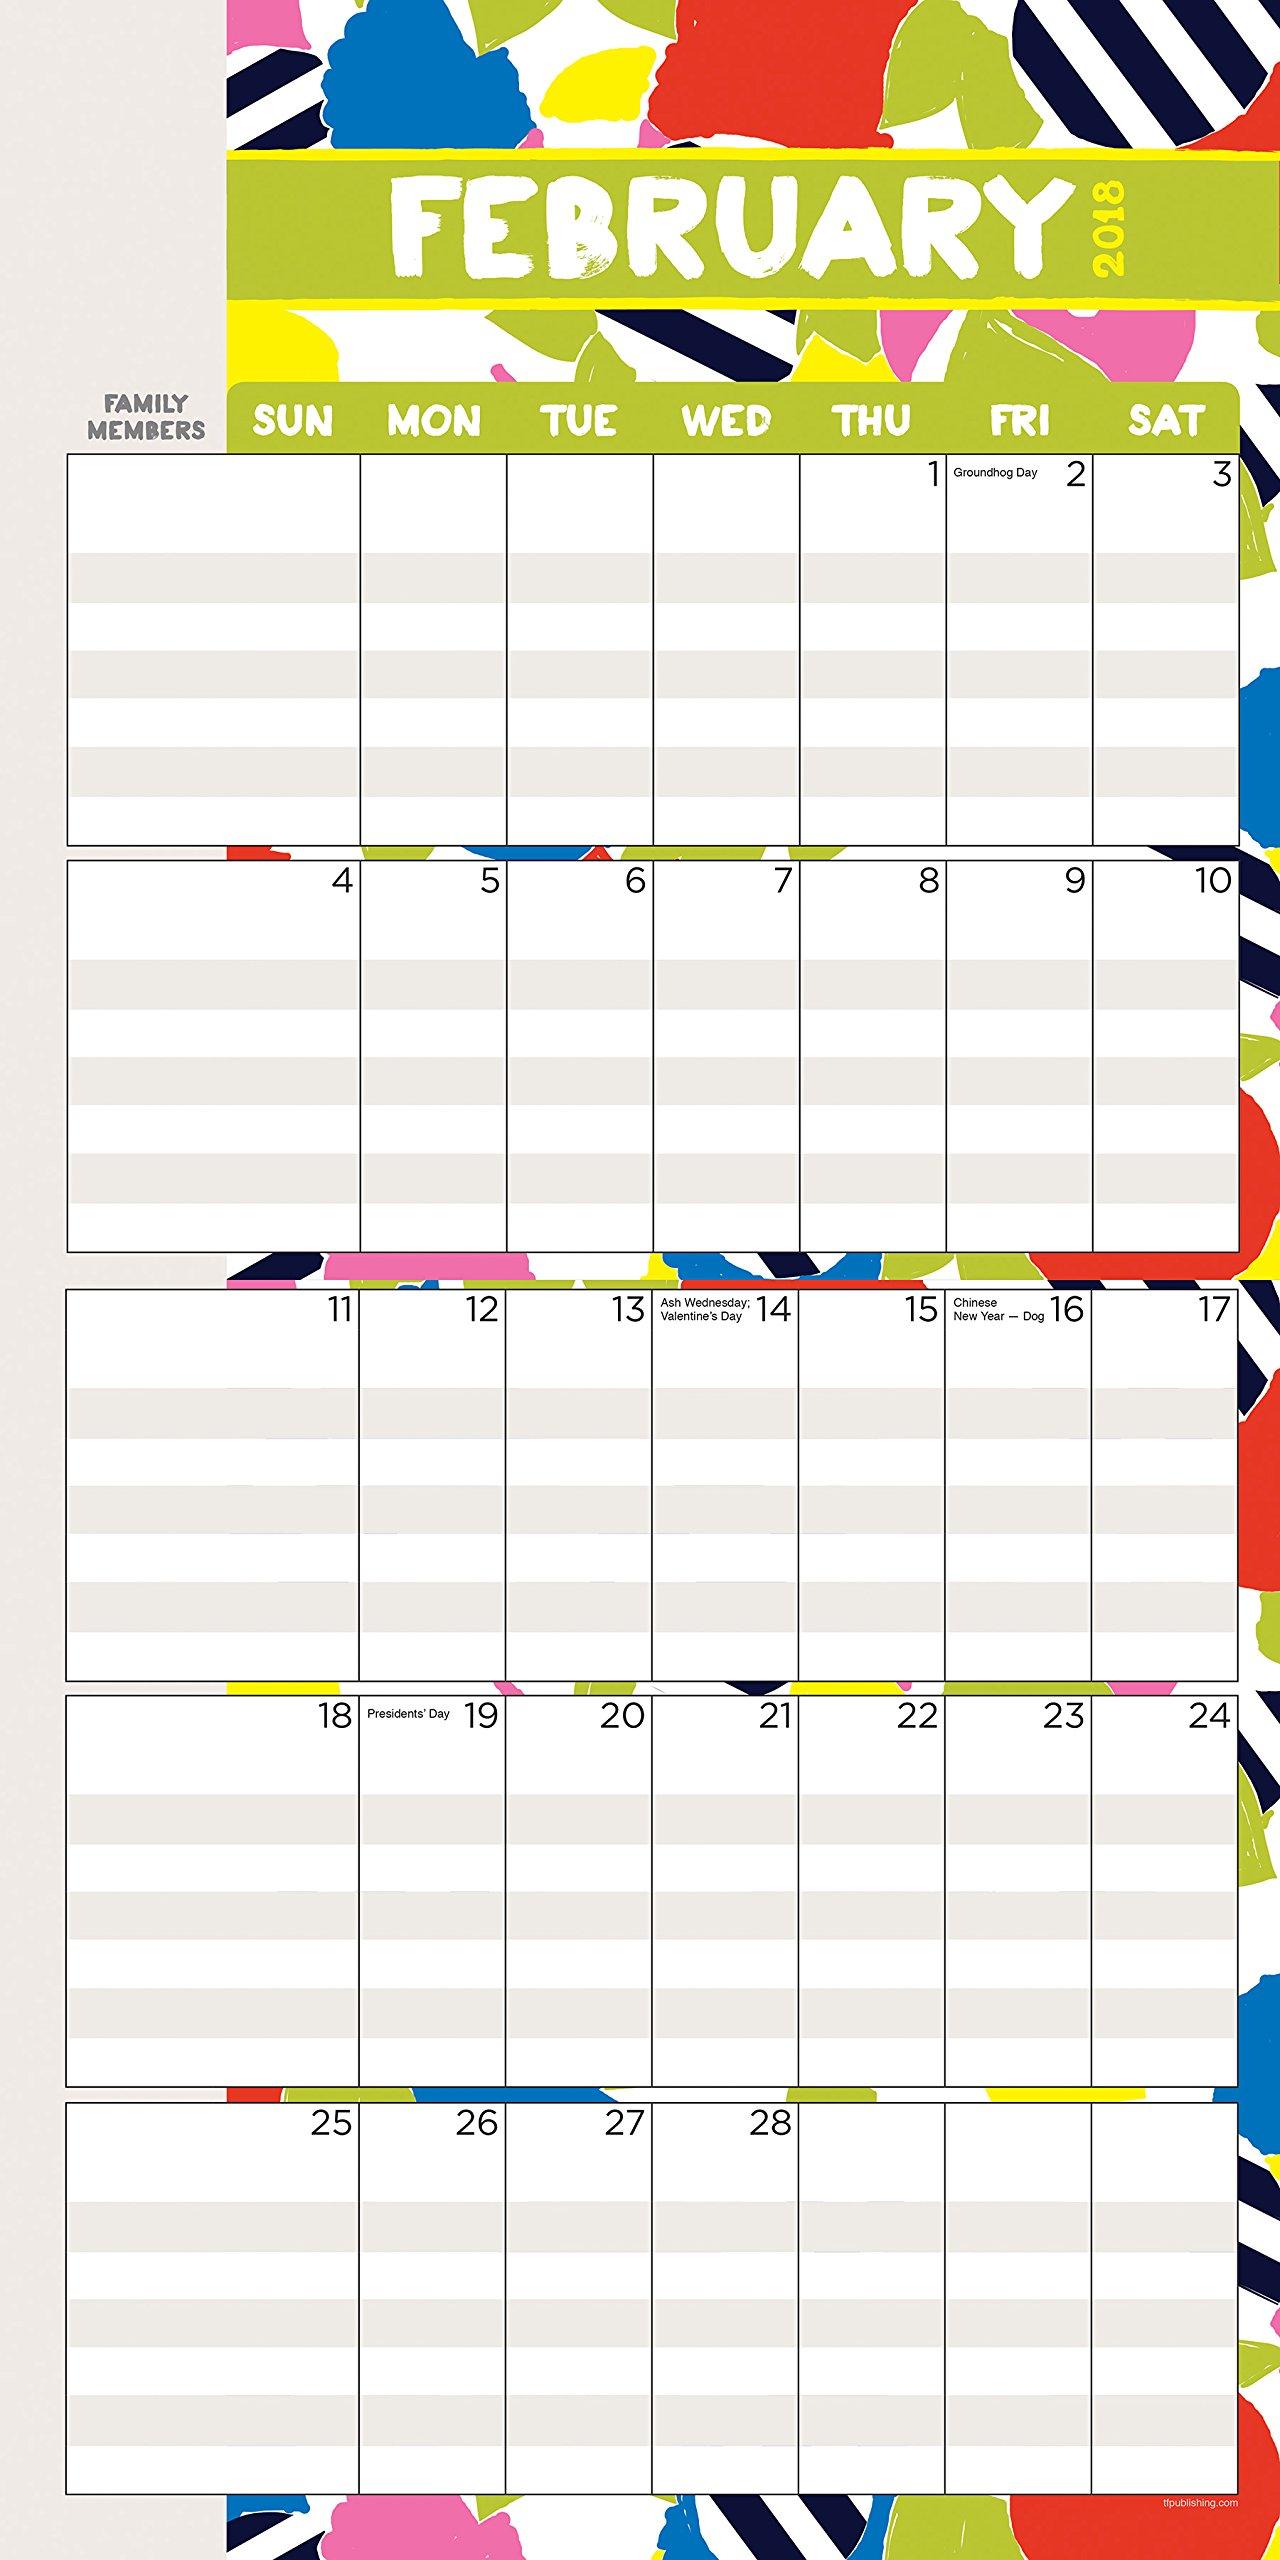 2018 Mom's Manager Large Grid Planning Wall Calendar: TF Publishing:  9781683750963: Amazon.com: Books